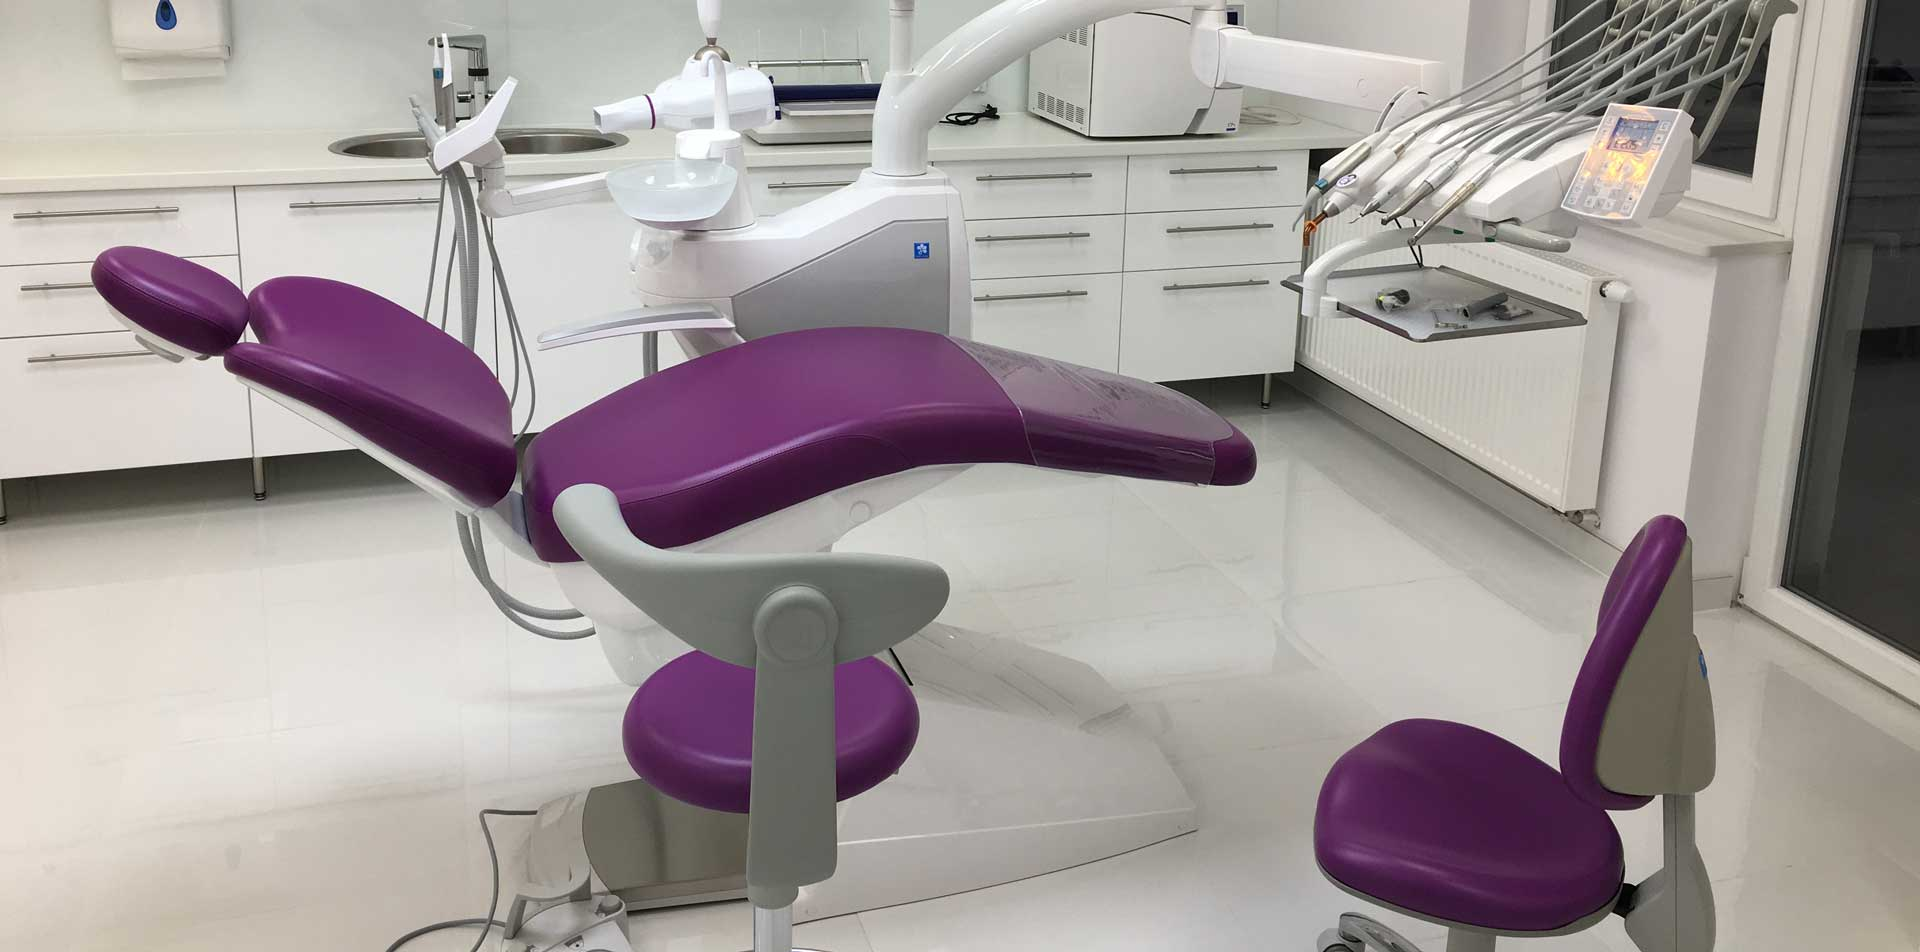 centrum dentex zabiegi stomatologiczne